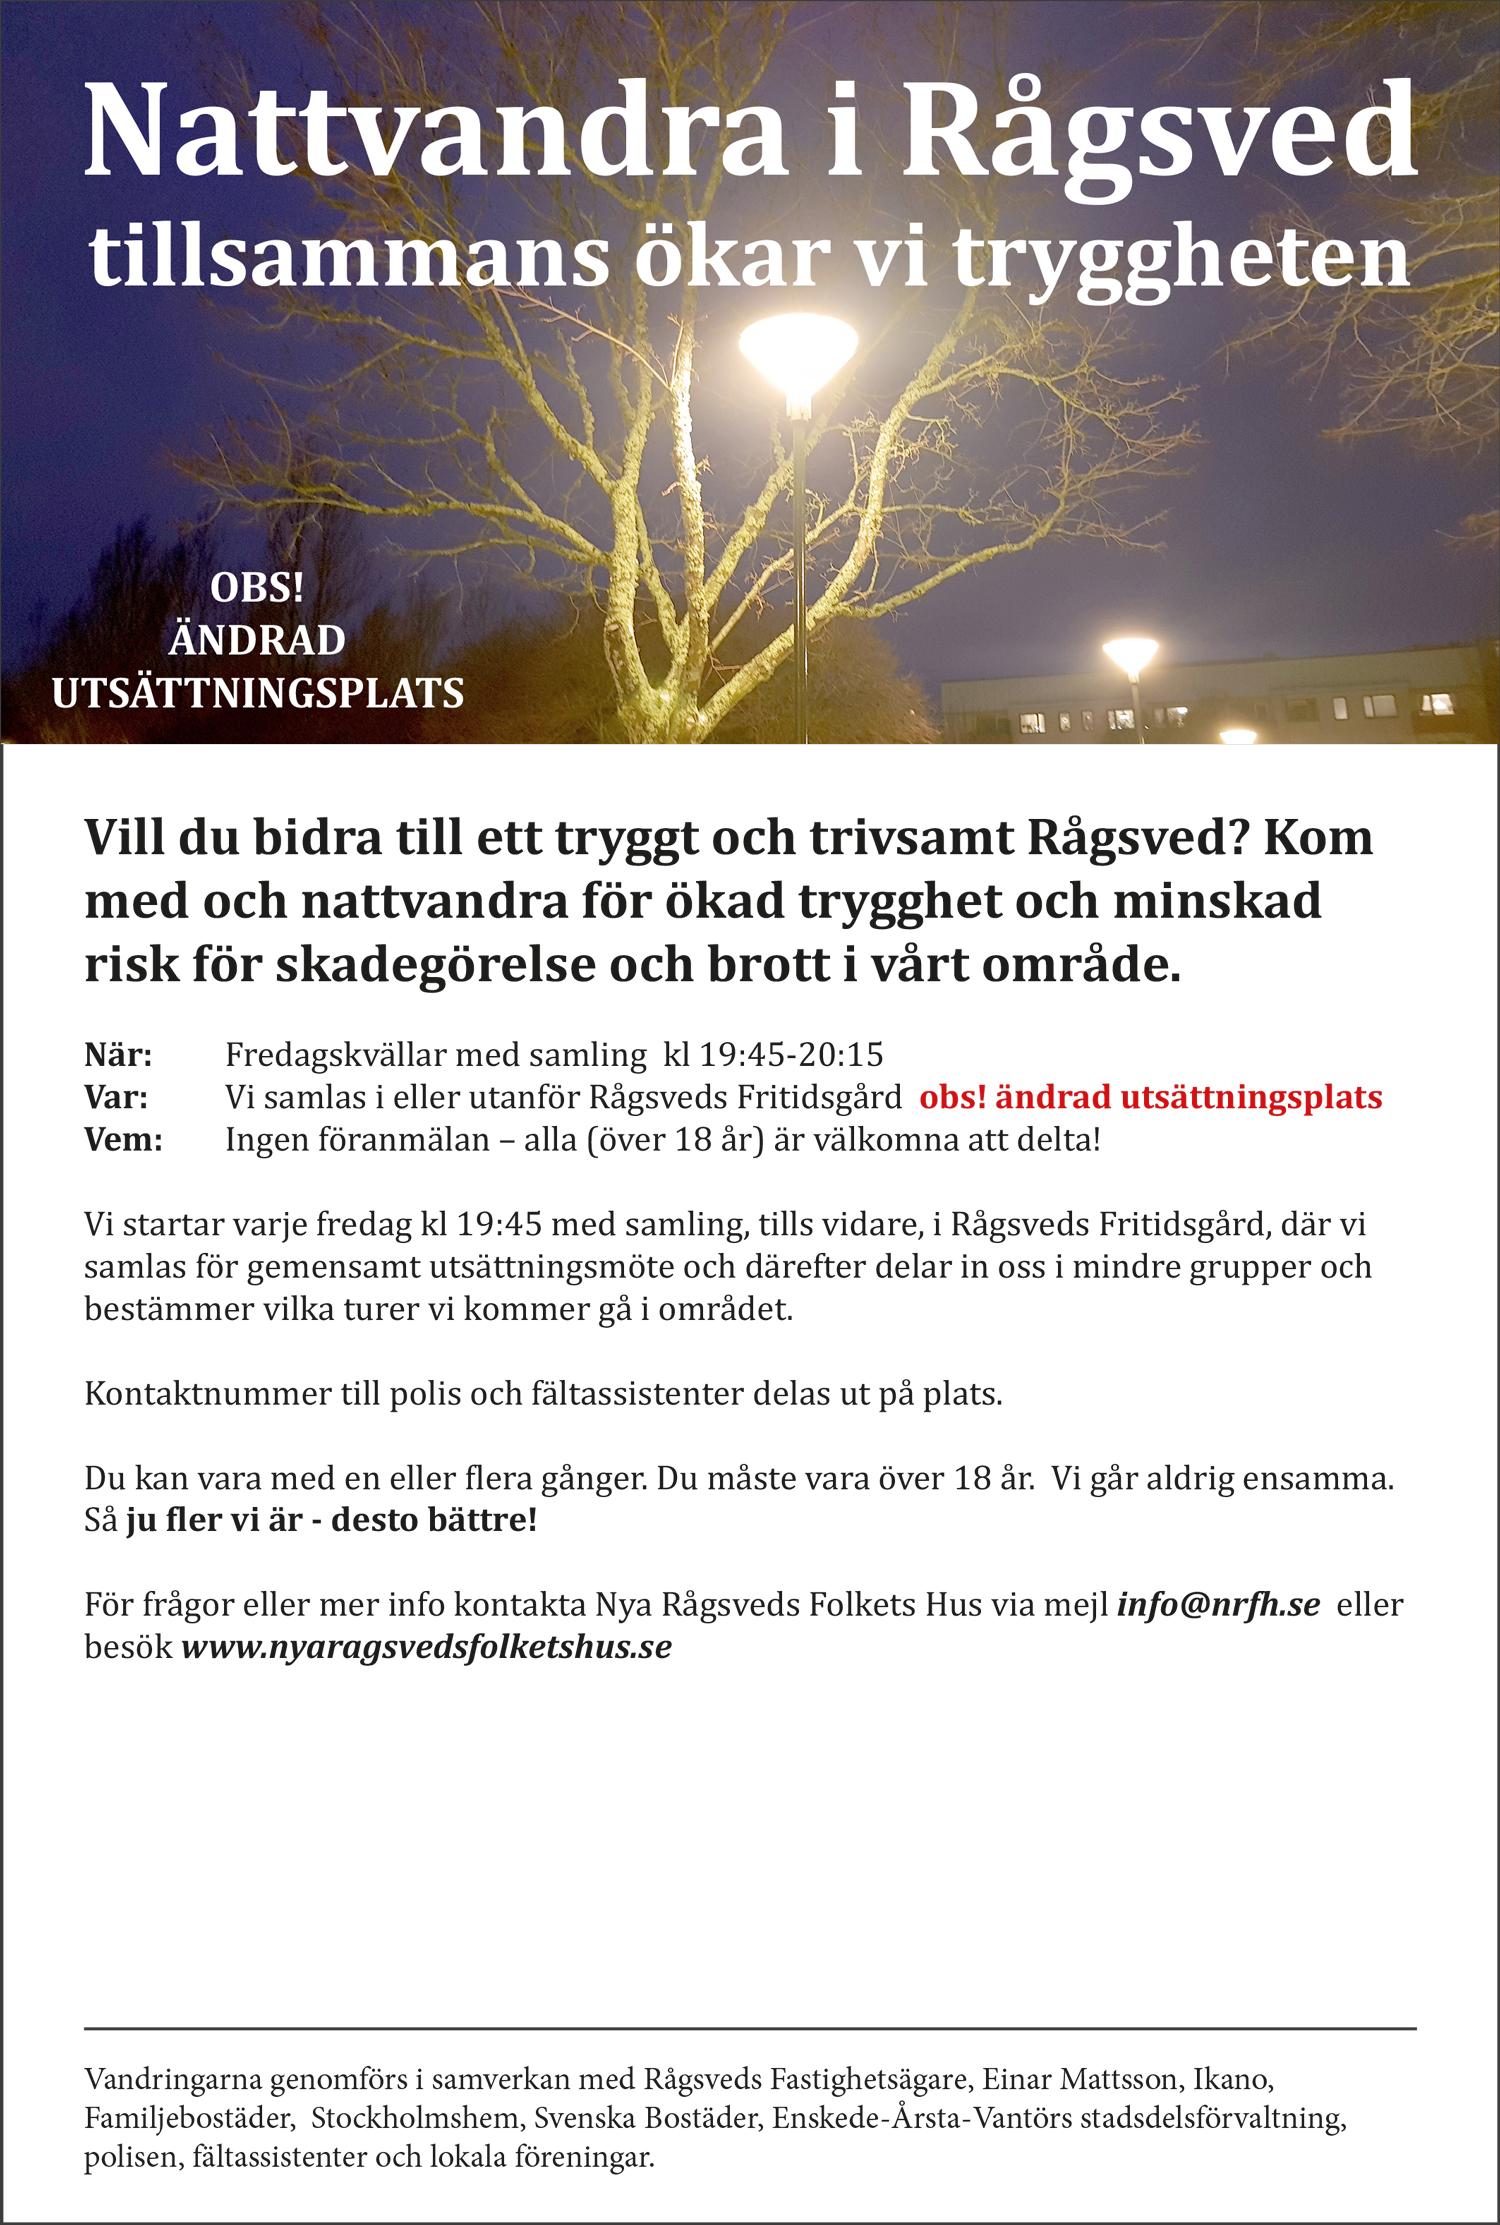 Nattvandra i Rågsved 2020